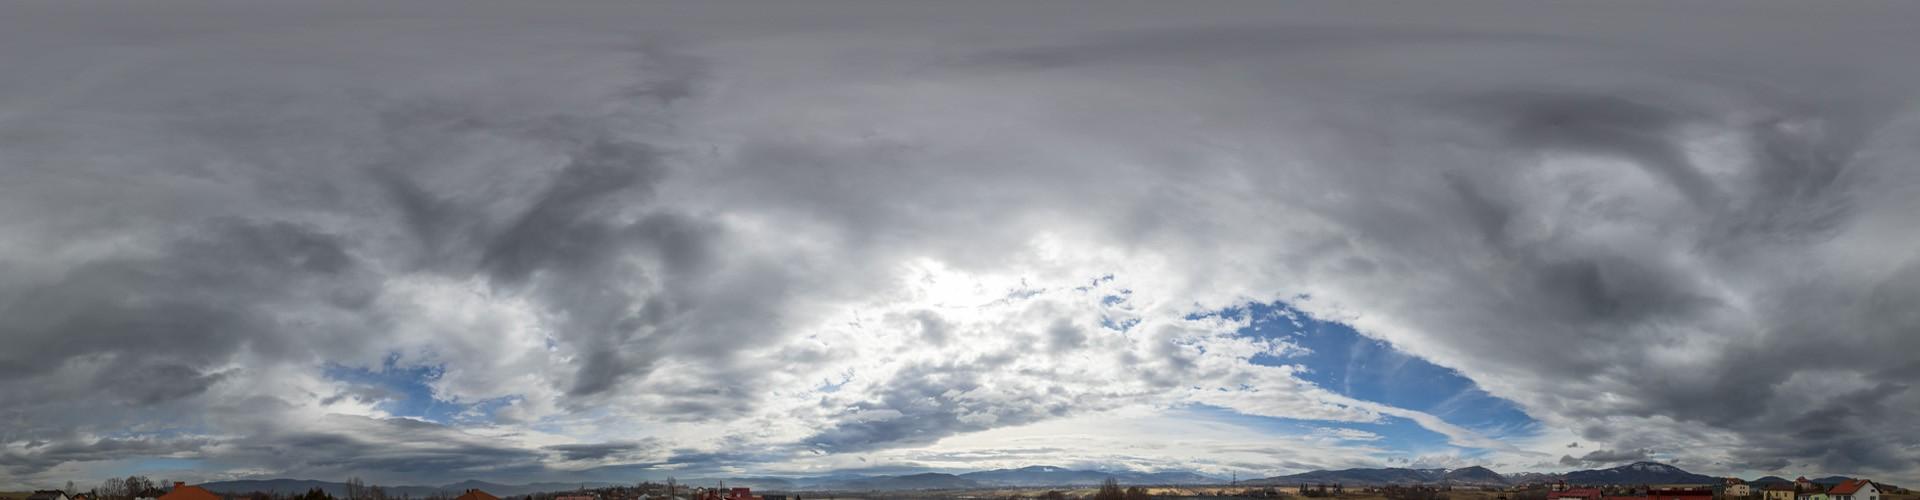 Cloudy Mountains 8212 (30k)